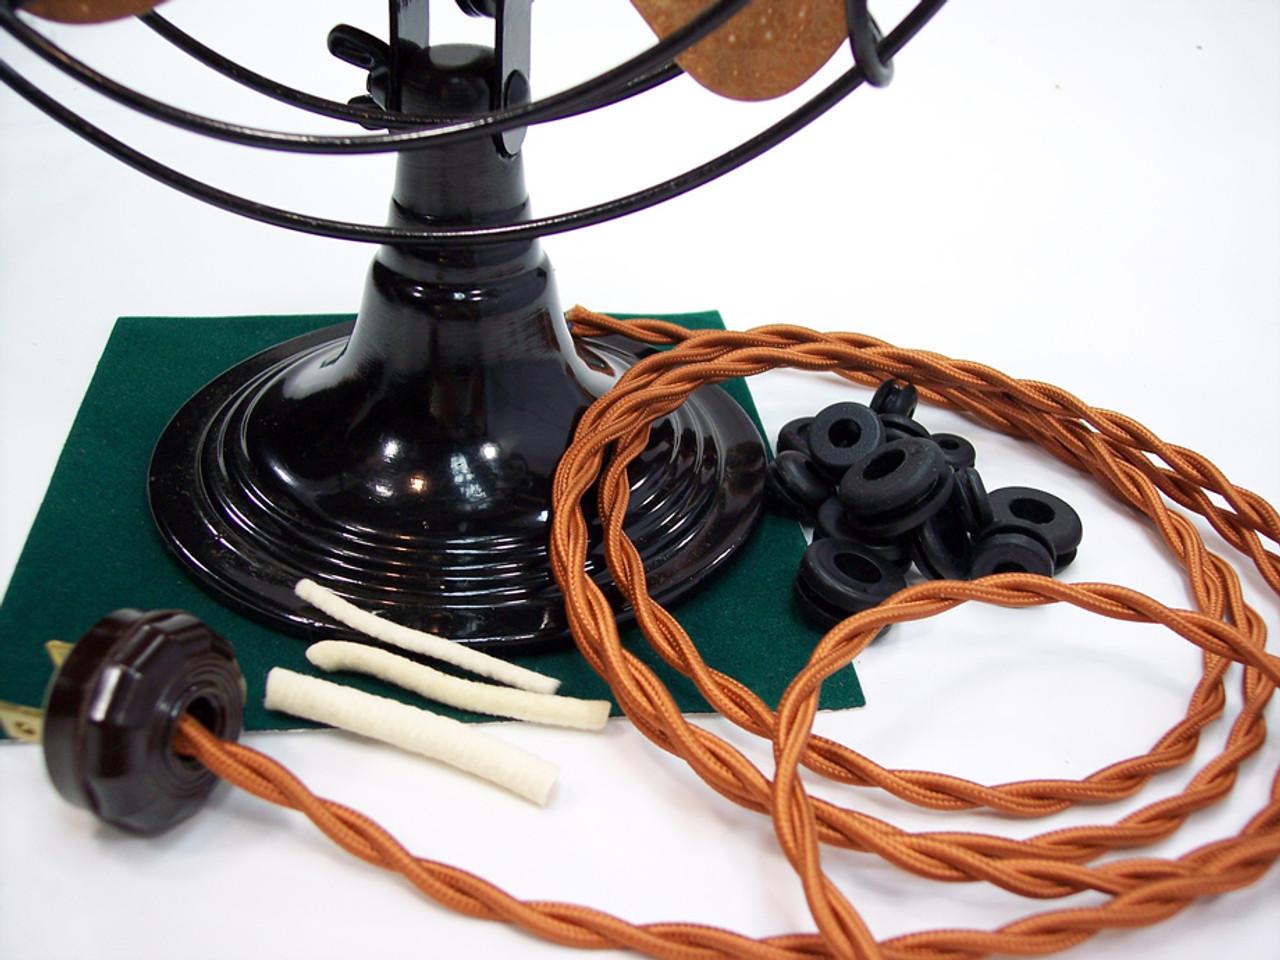 Antique Fan Restoration Kit on